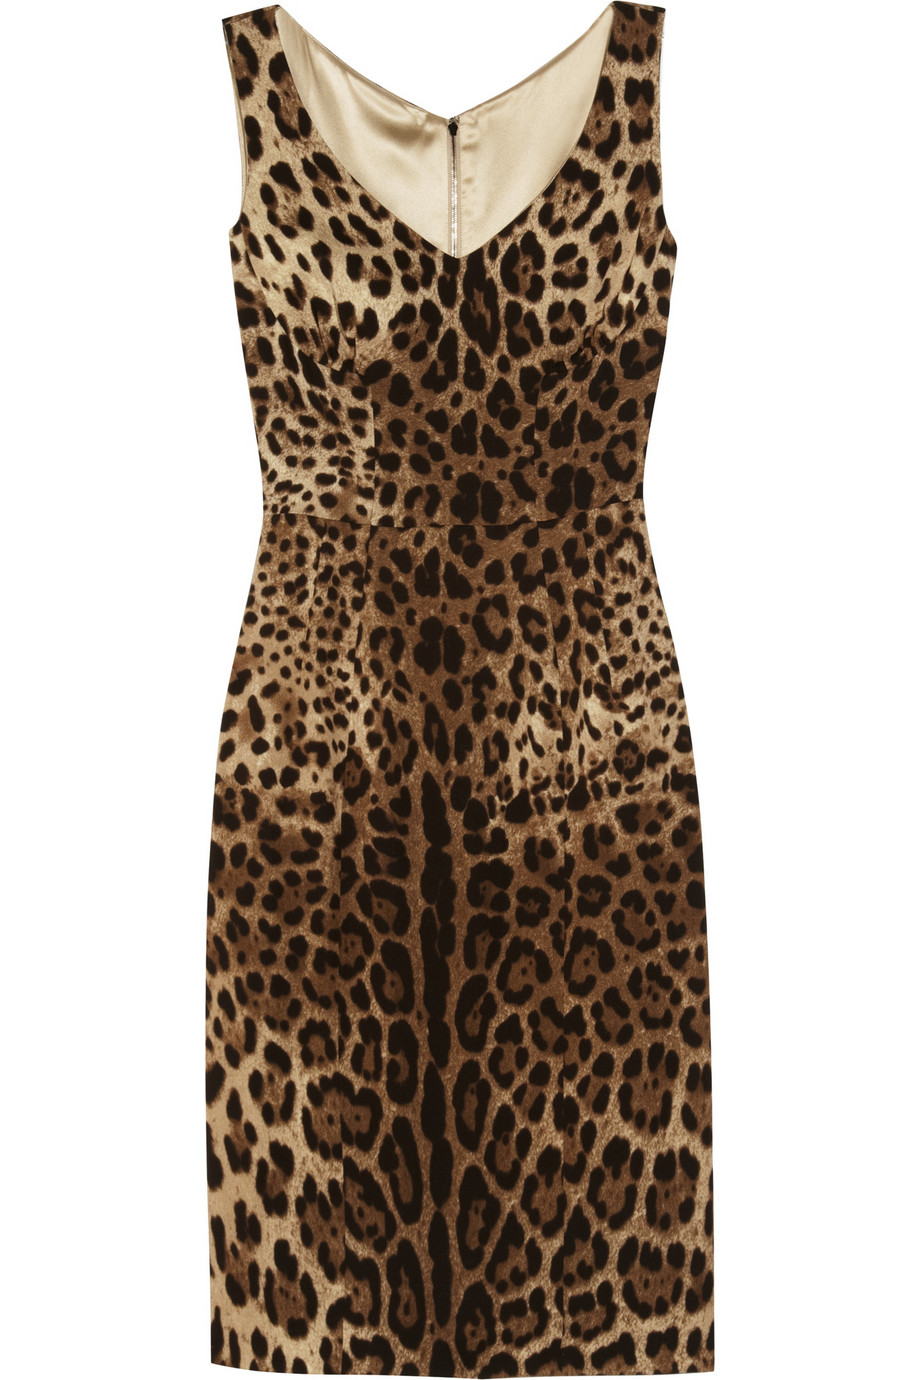 dolce gabbana leopard print crepe dress in multicolor